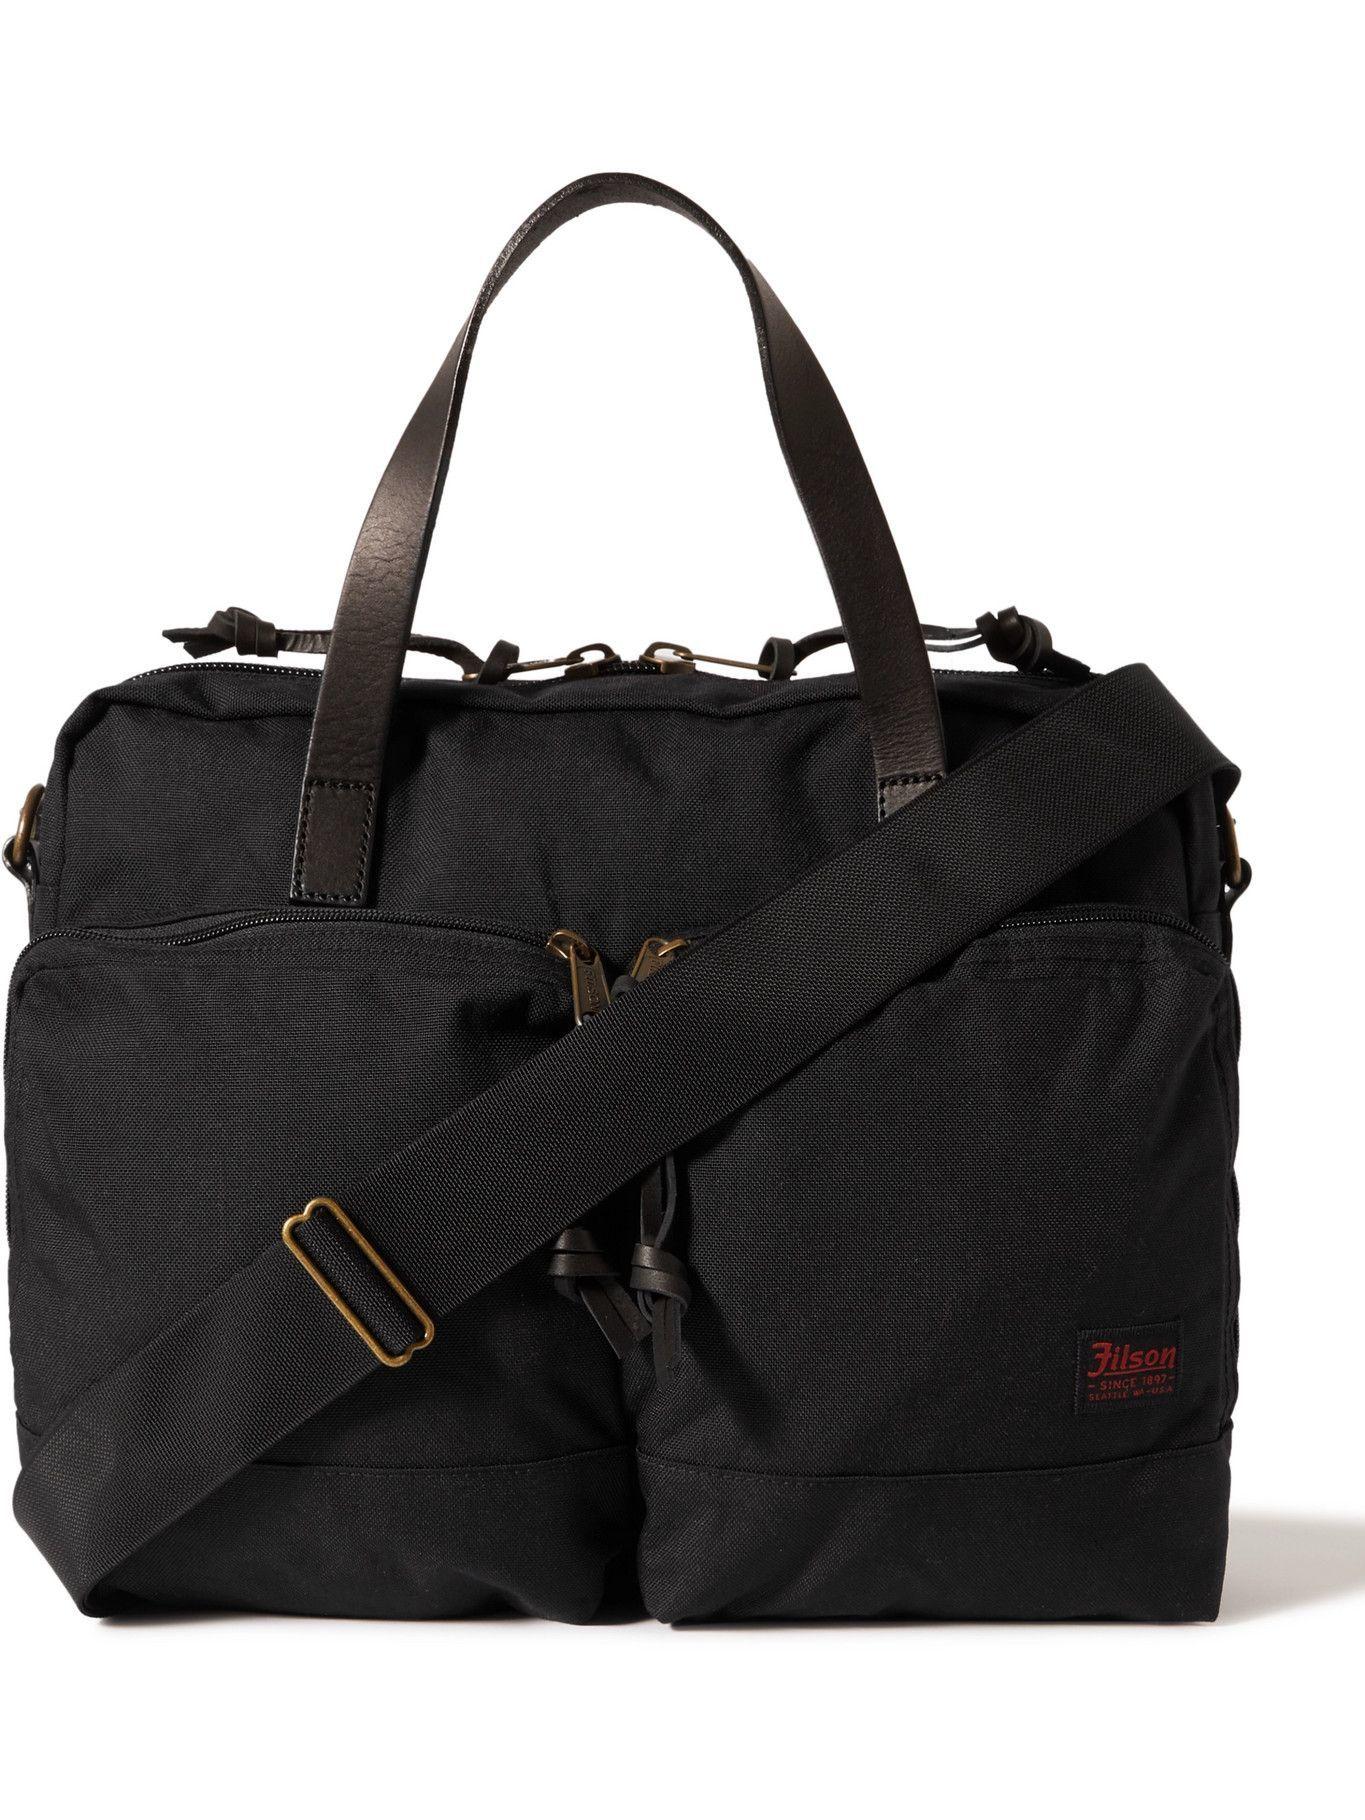 FILSON - Dryden Leather-Trimmed Nylon Briefcase